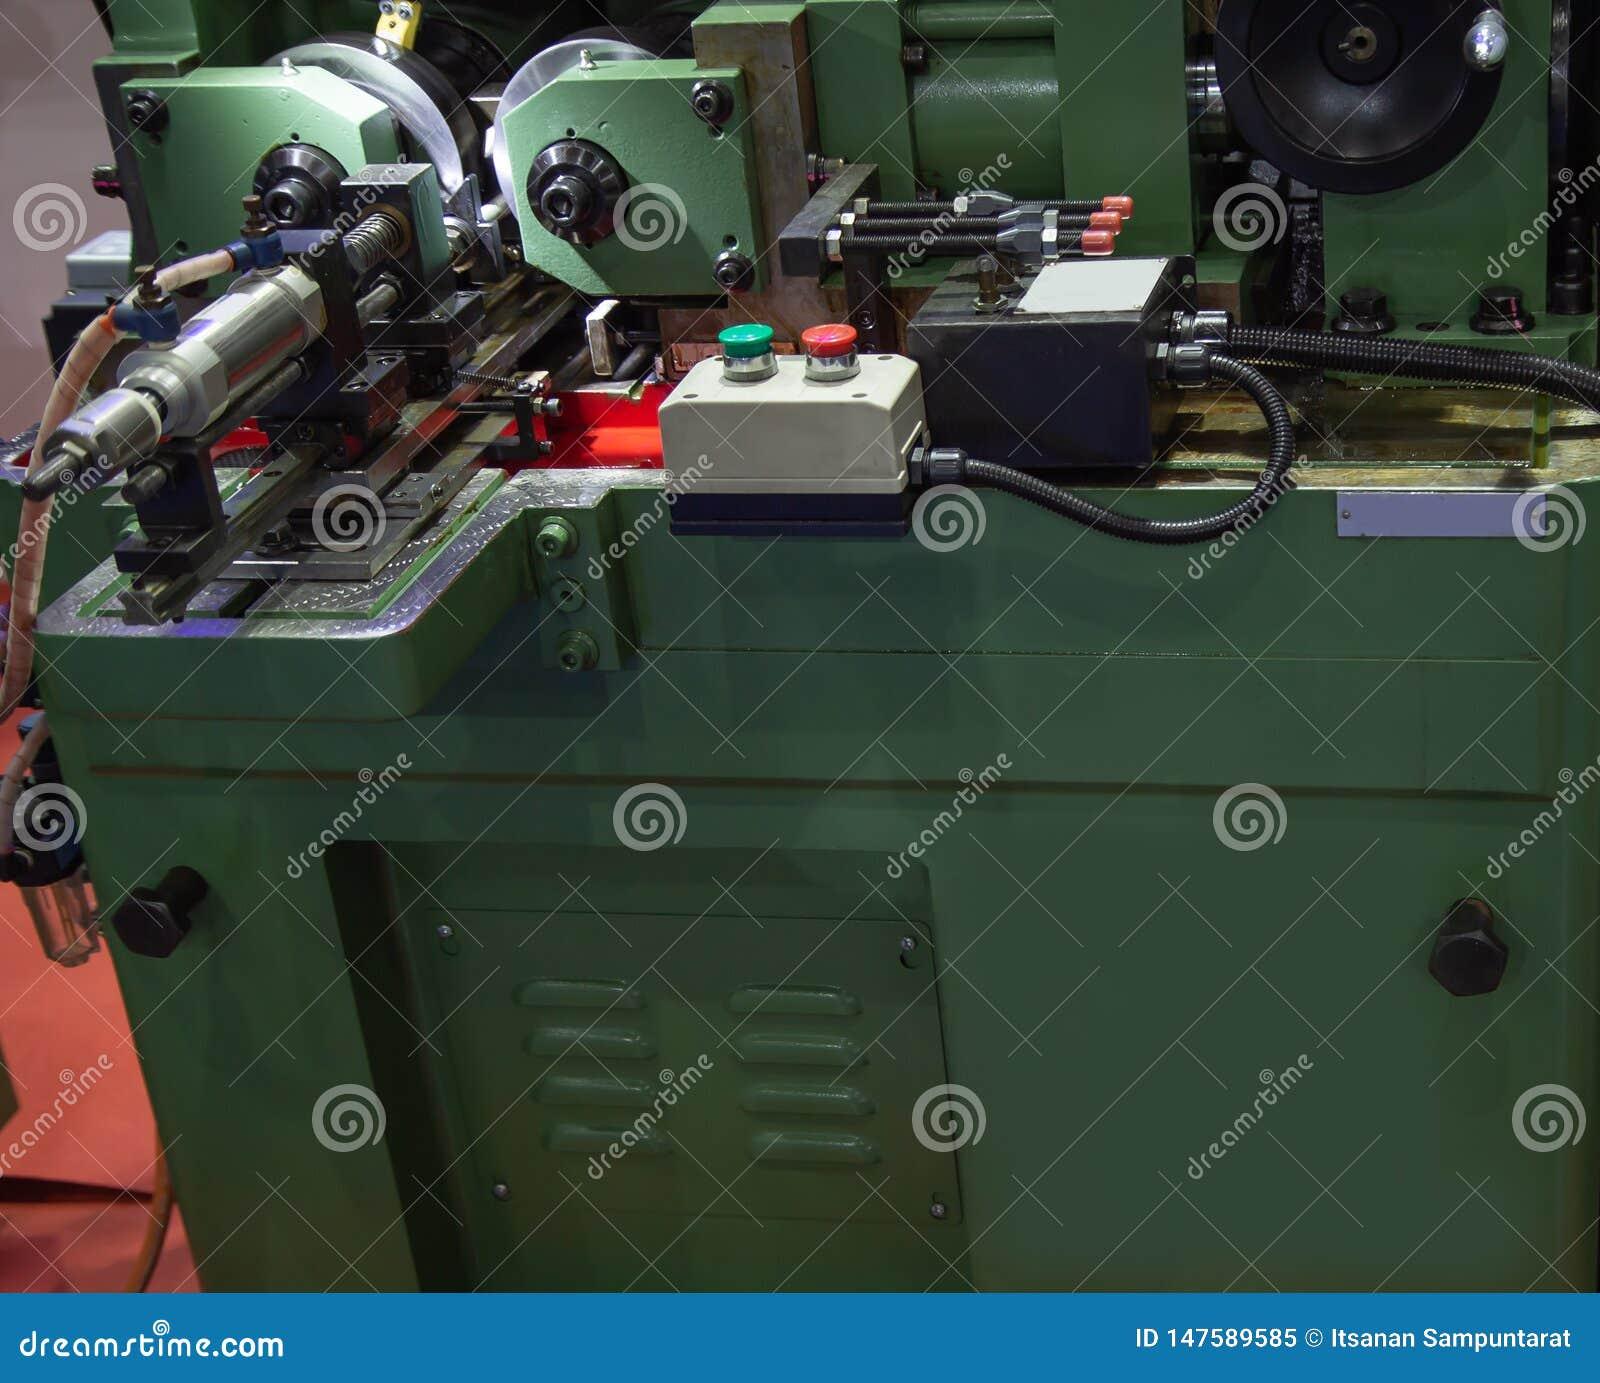 Thread rolling machine stock image  Image of equipment